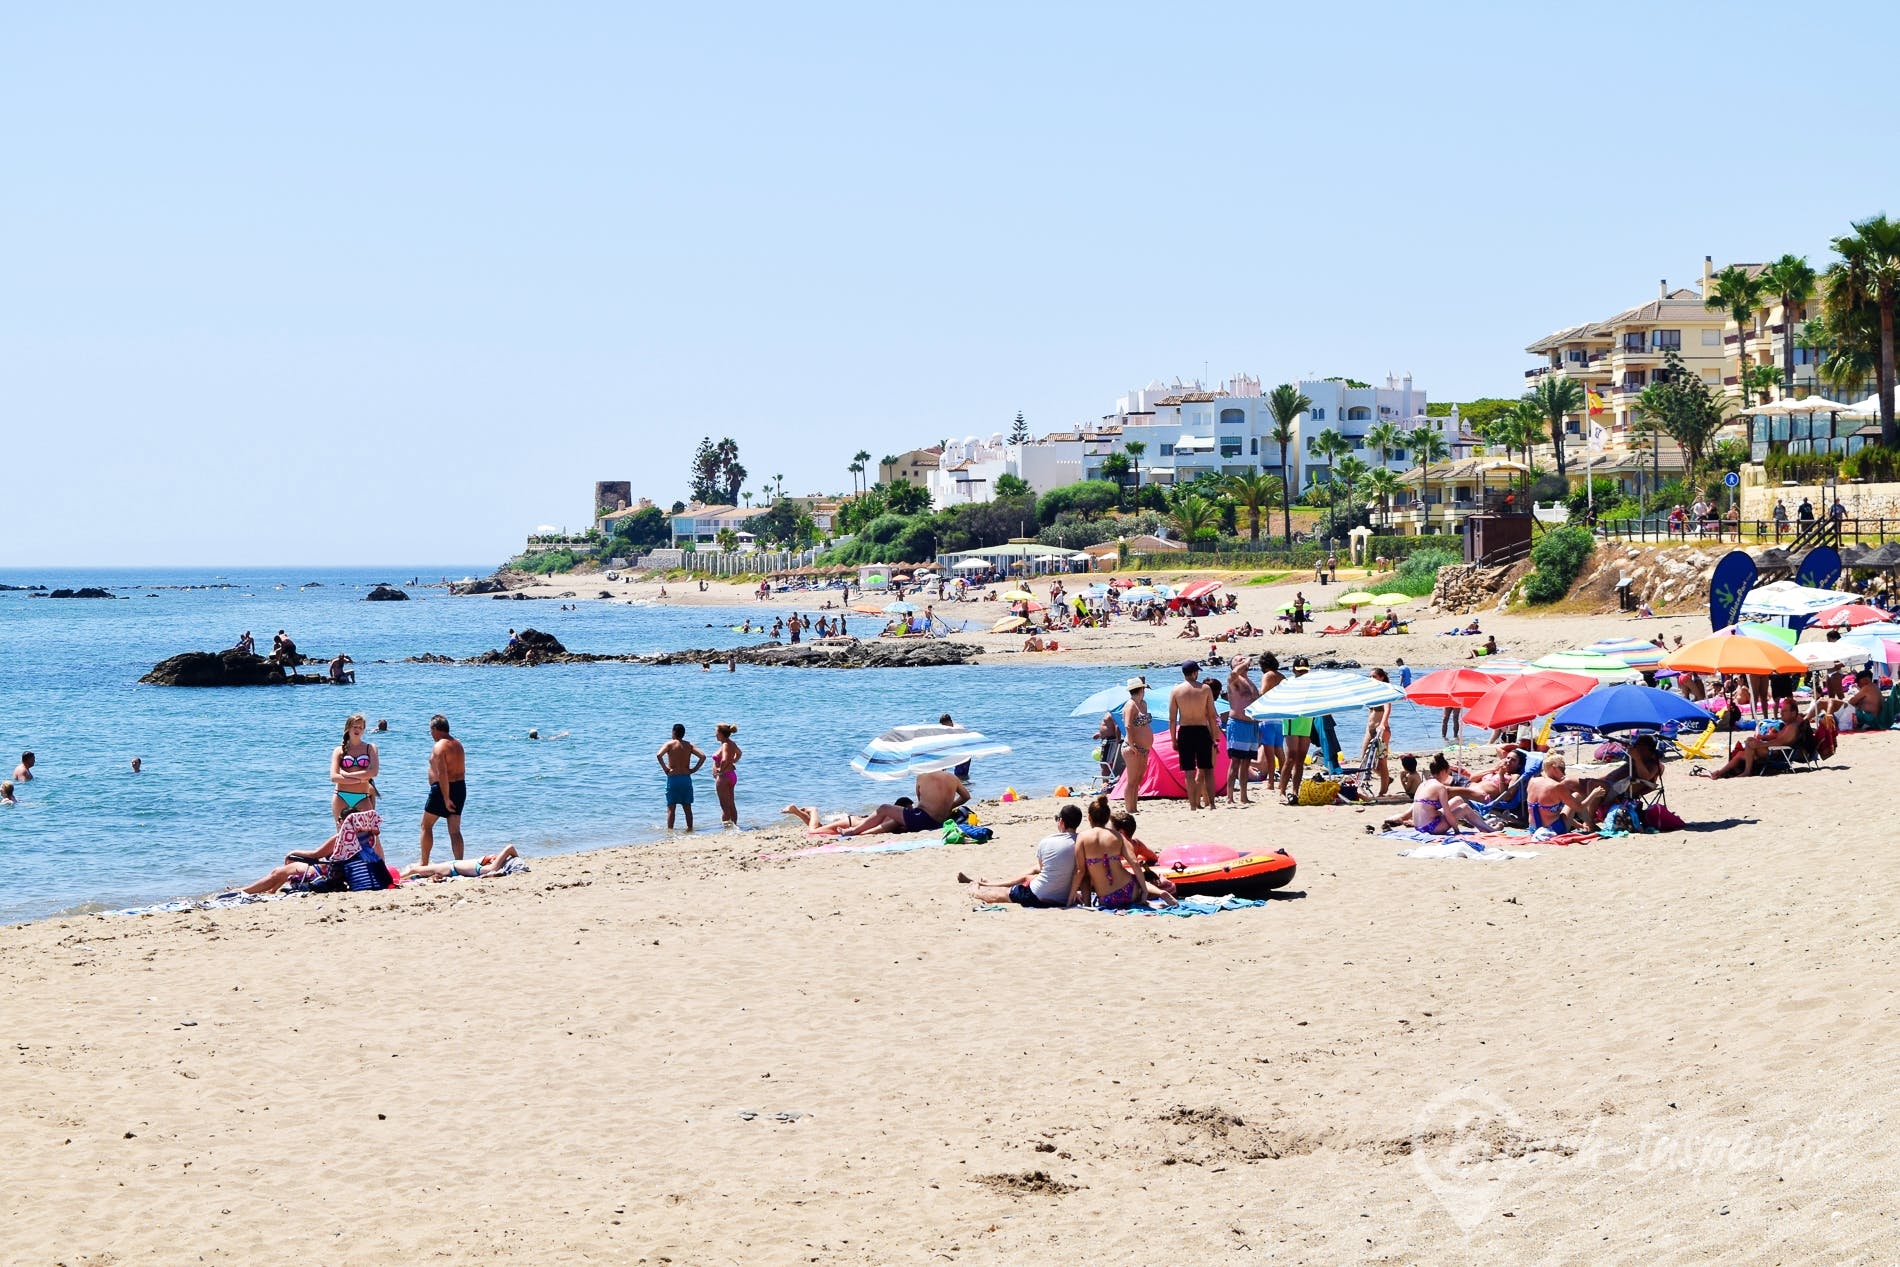 Beach Playa de Calahonda, Costa del Sol, Spain